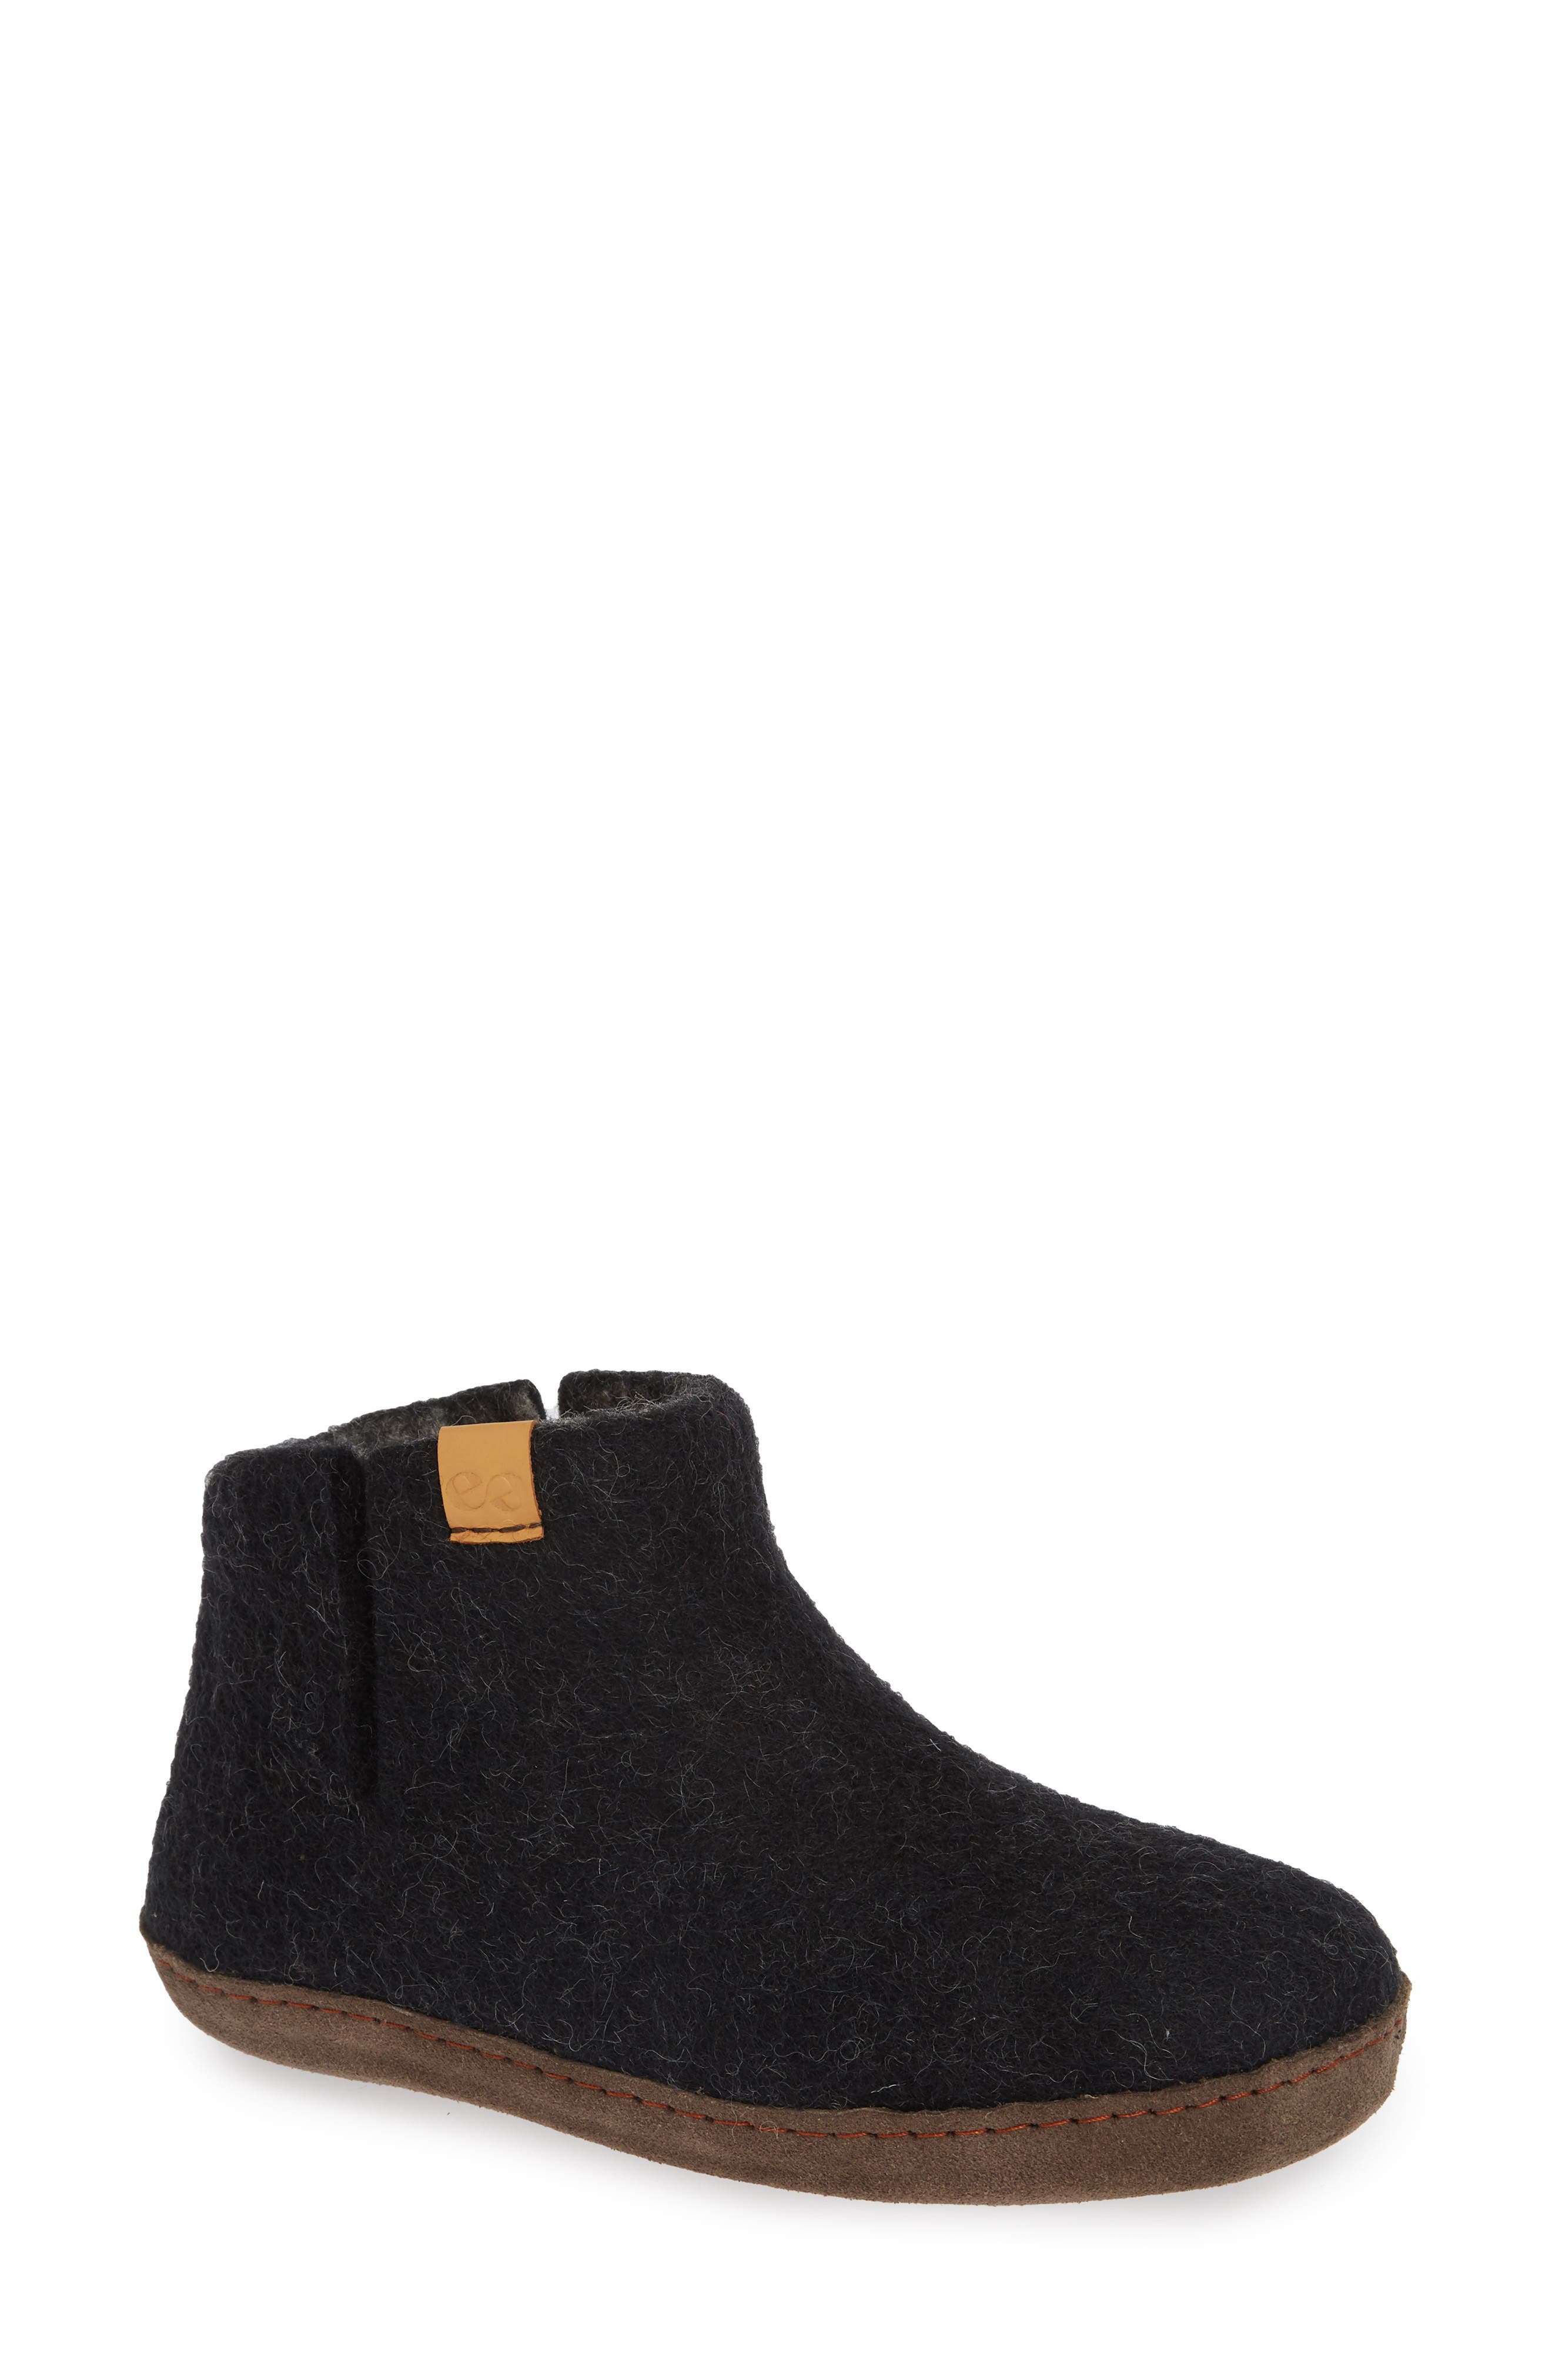 Everest Wool Slipper,                         Main,                         color, BLACK WOOL